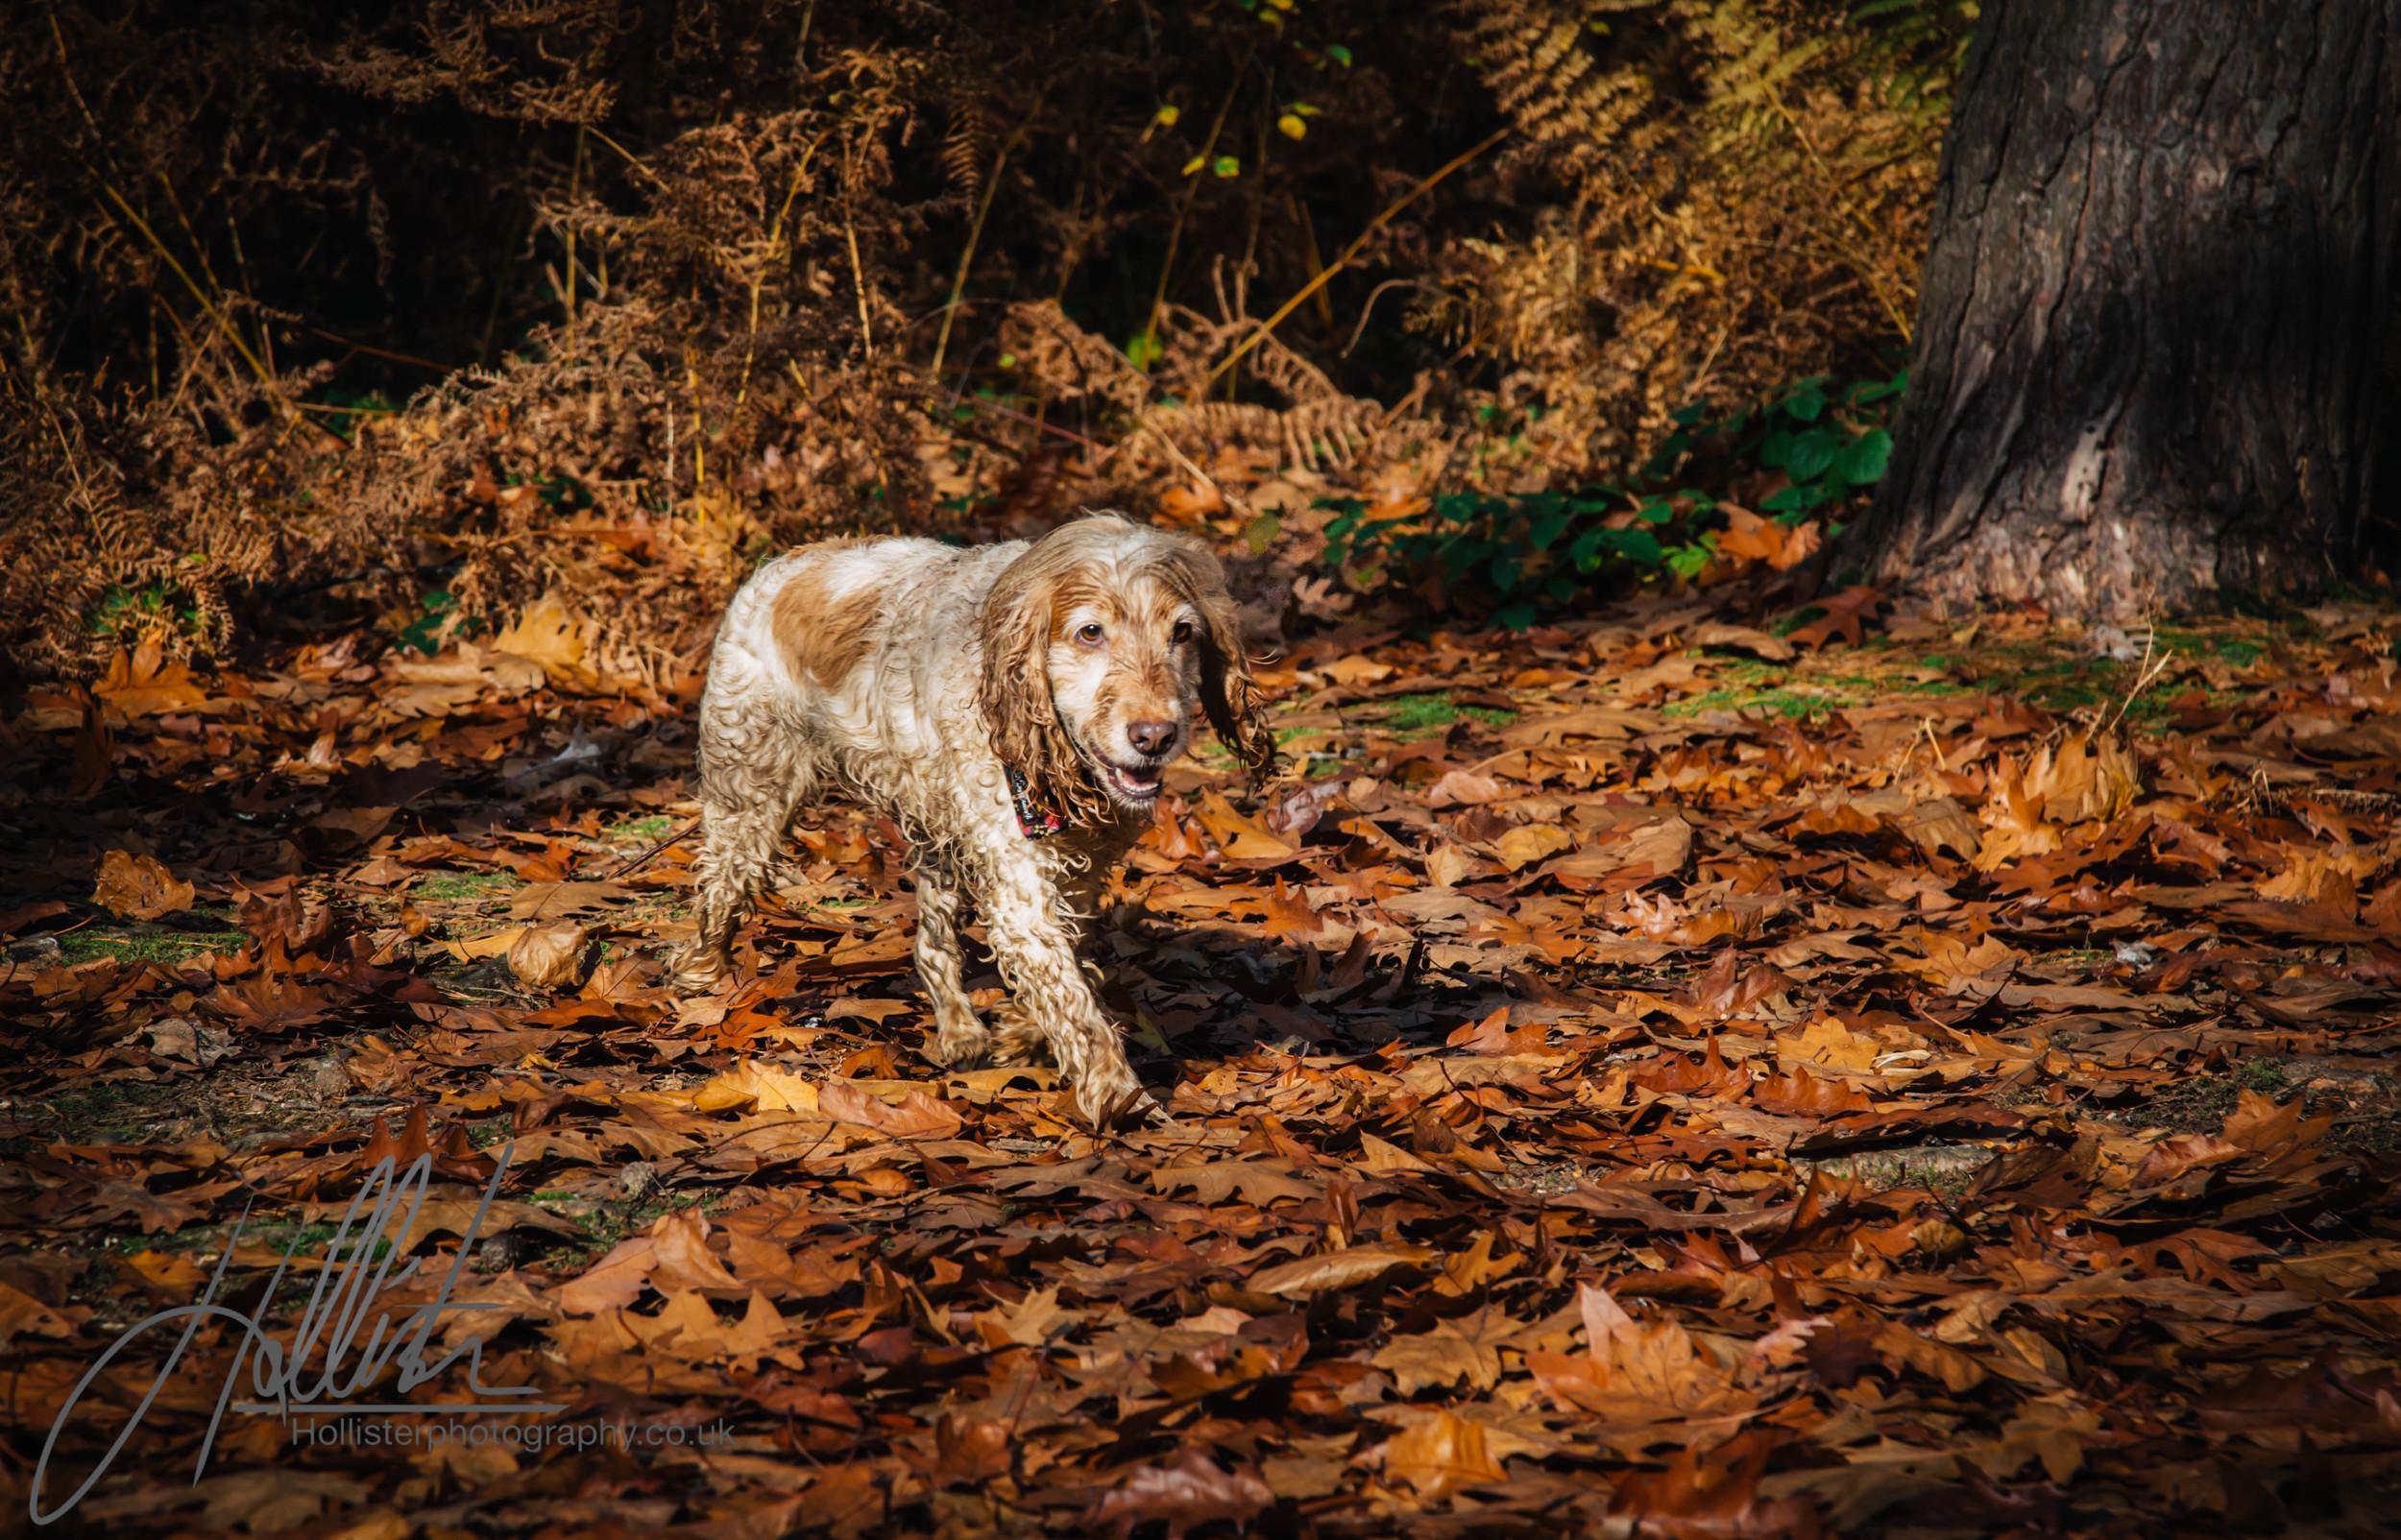 Hollisterphotography ABBY CLOWES WOOD DOG WALK-76.JPG